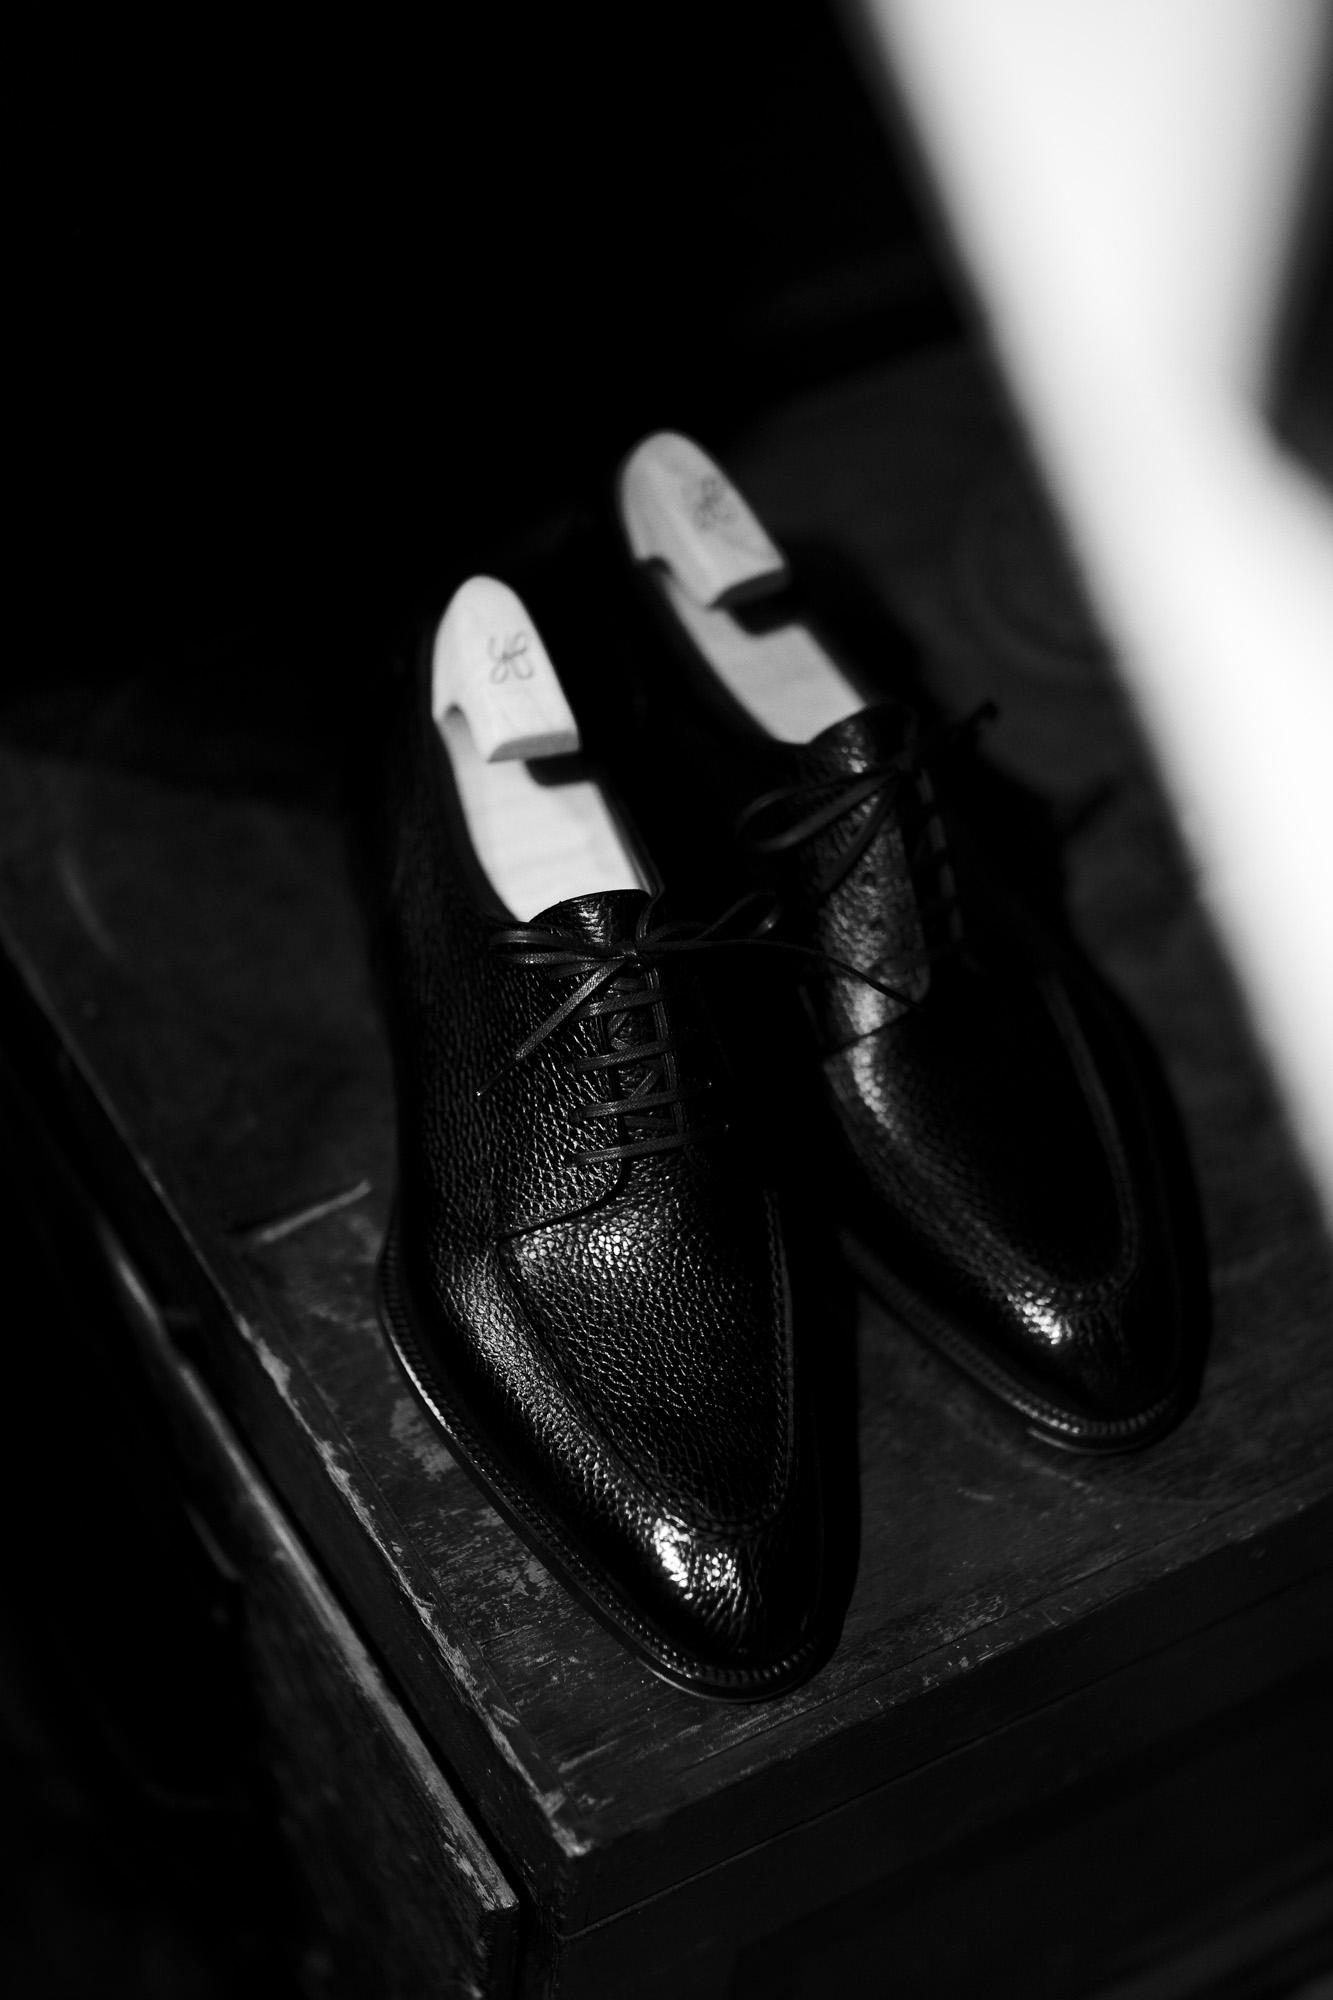 "Yohei Fukuda ""MTO"" Split Toe Derby Shoes Black Big Grain 2021 ヨウヘイフクダ スプリットトゥーダービーシューズ ドレスシューズ 愛知 名古屋 Alto e Diritto altoediritto アルトエデリット Half Rubber Round Toe High Shine シューツリー"